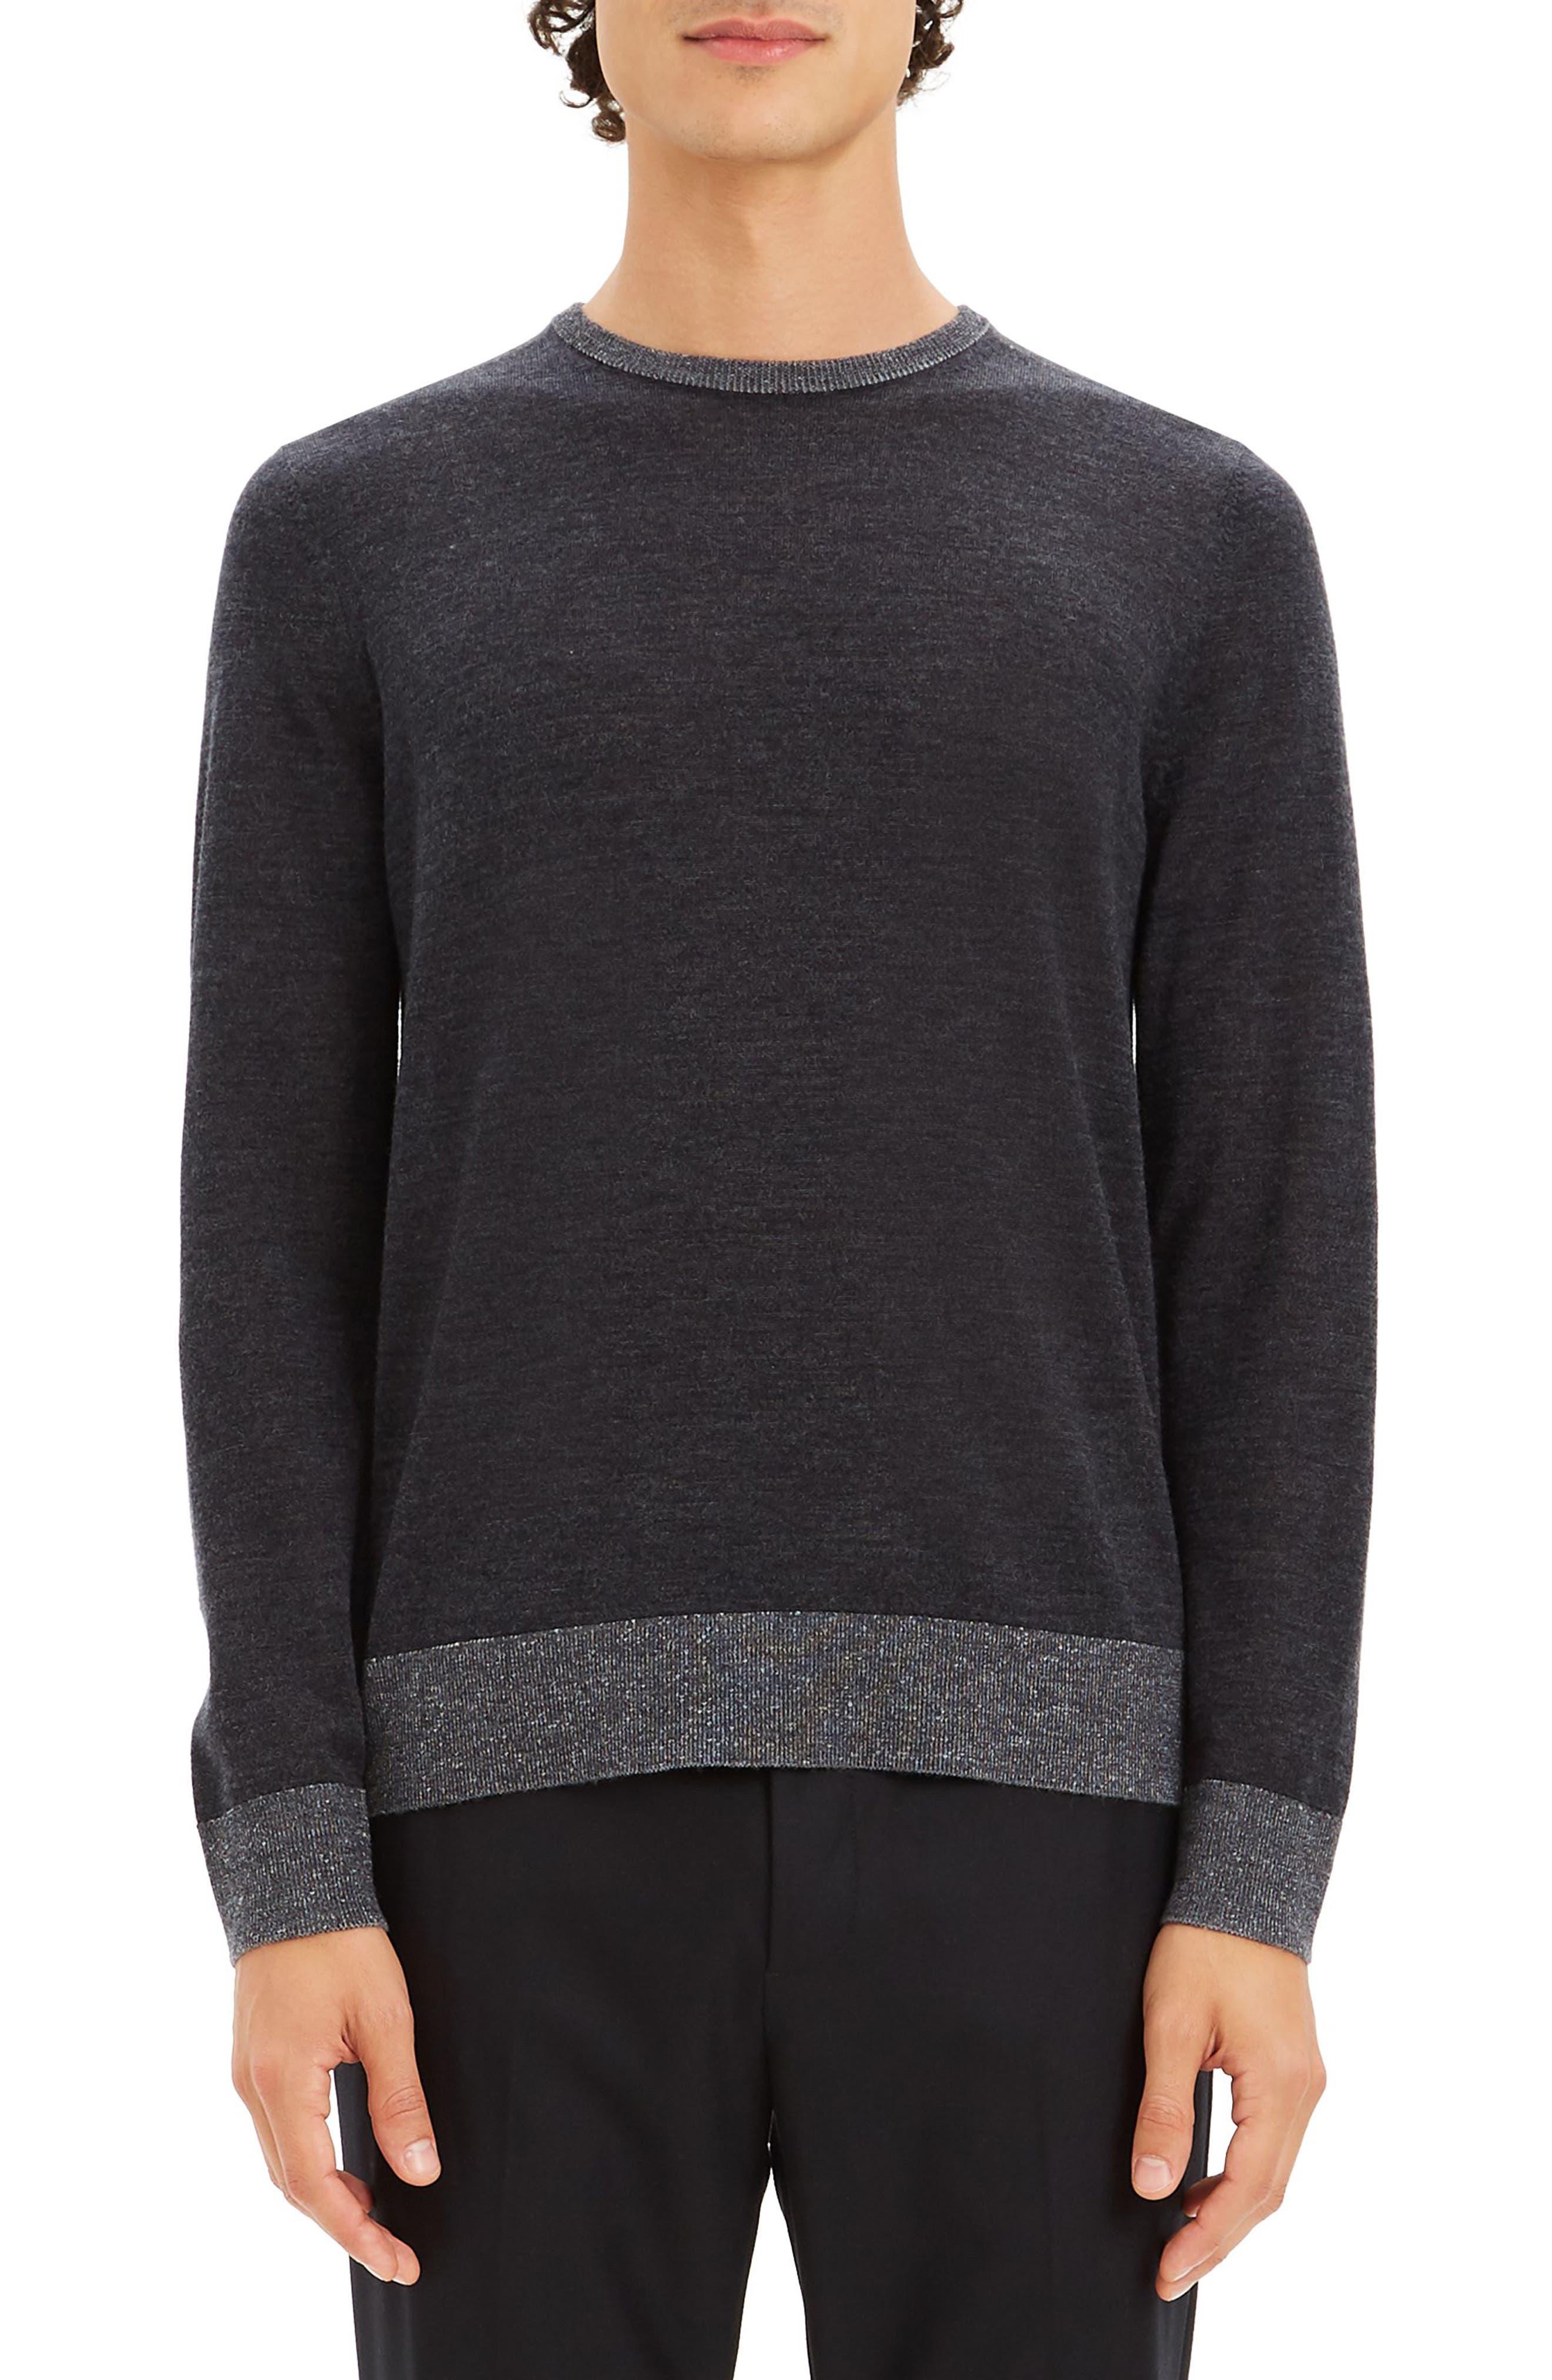 Theory Rothley Castellos Regular Fit Merino Wool Sweater, Grey